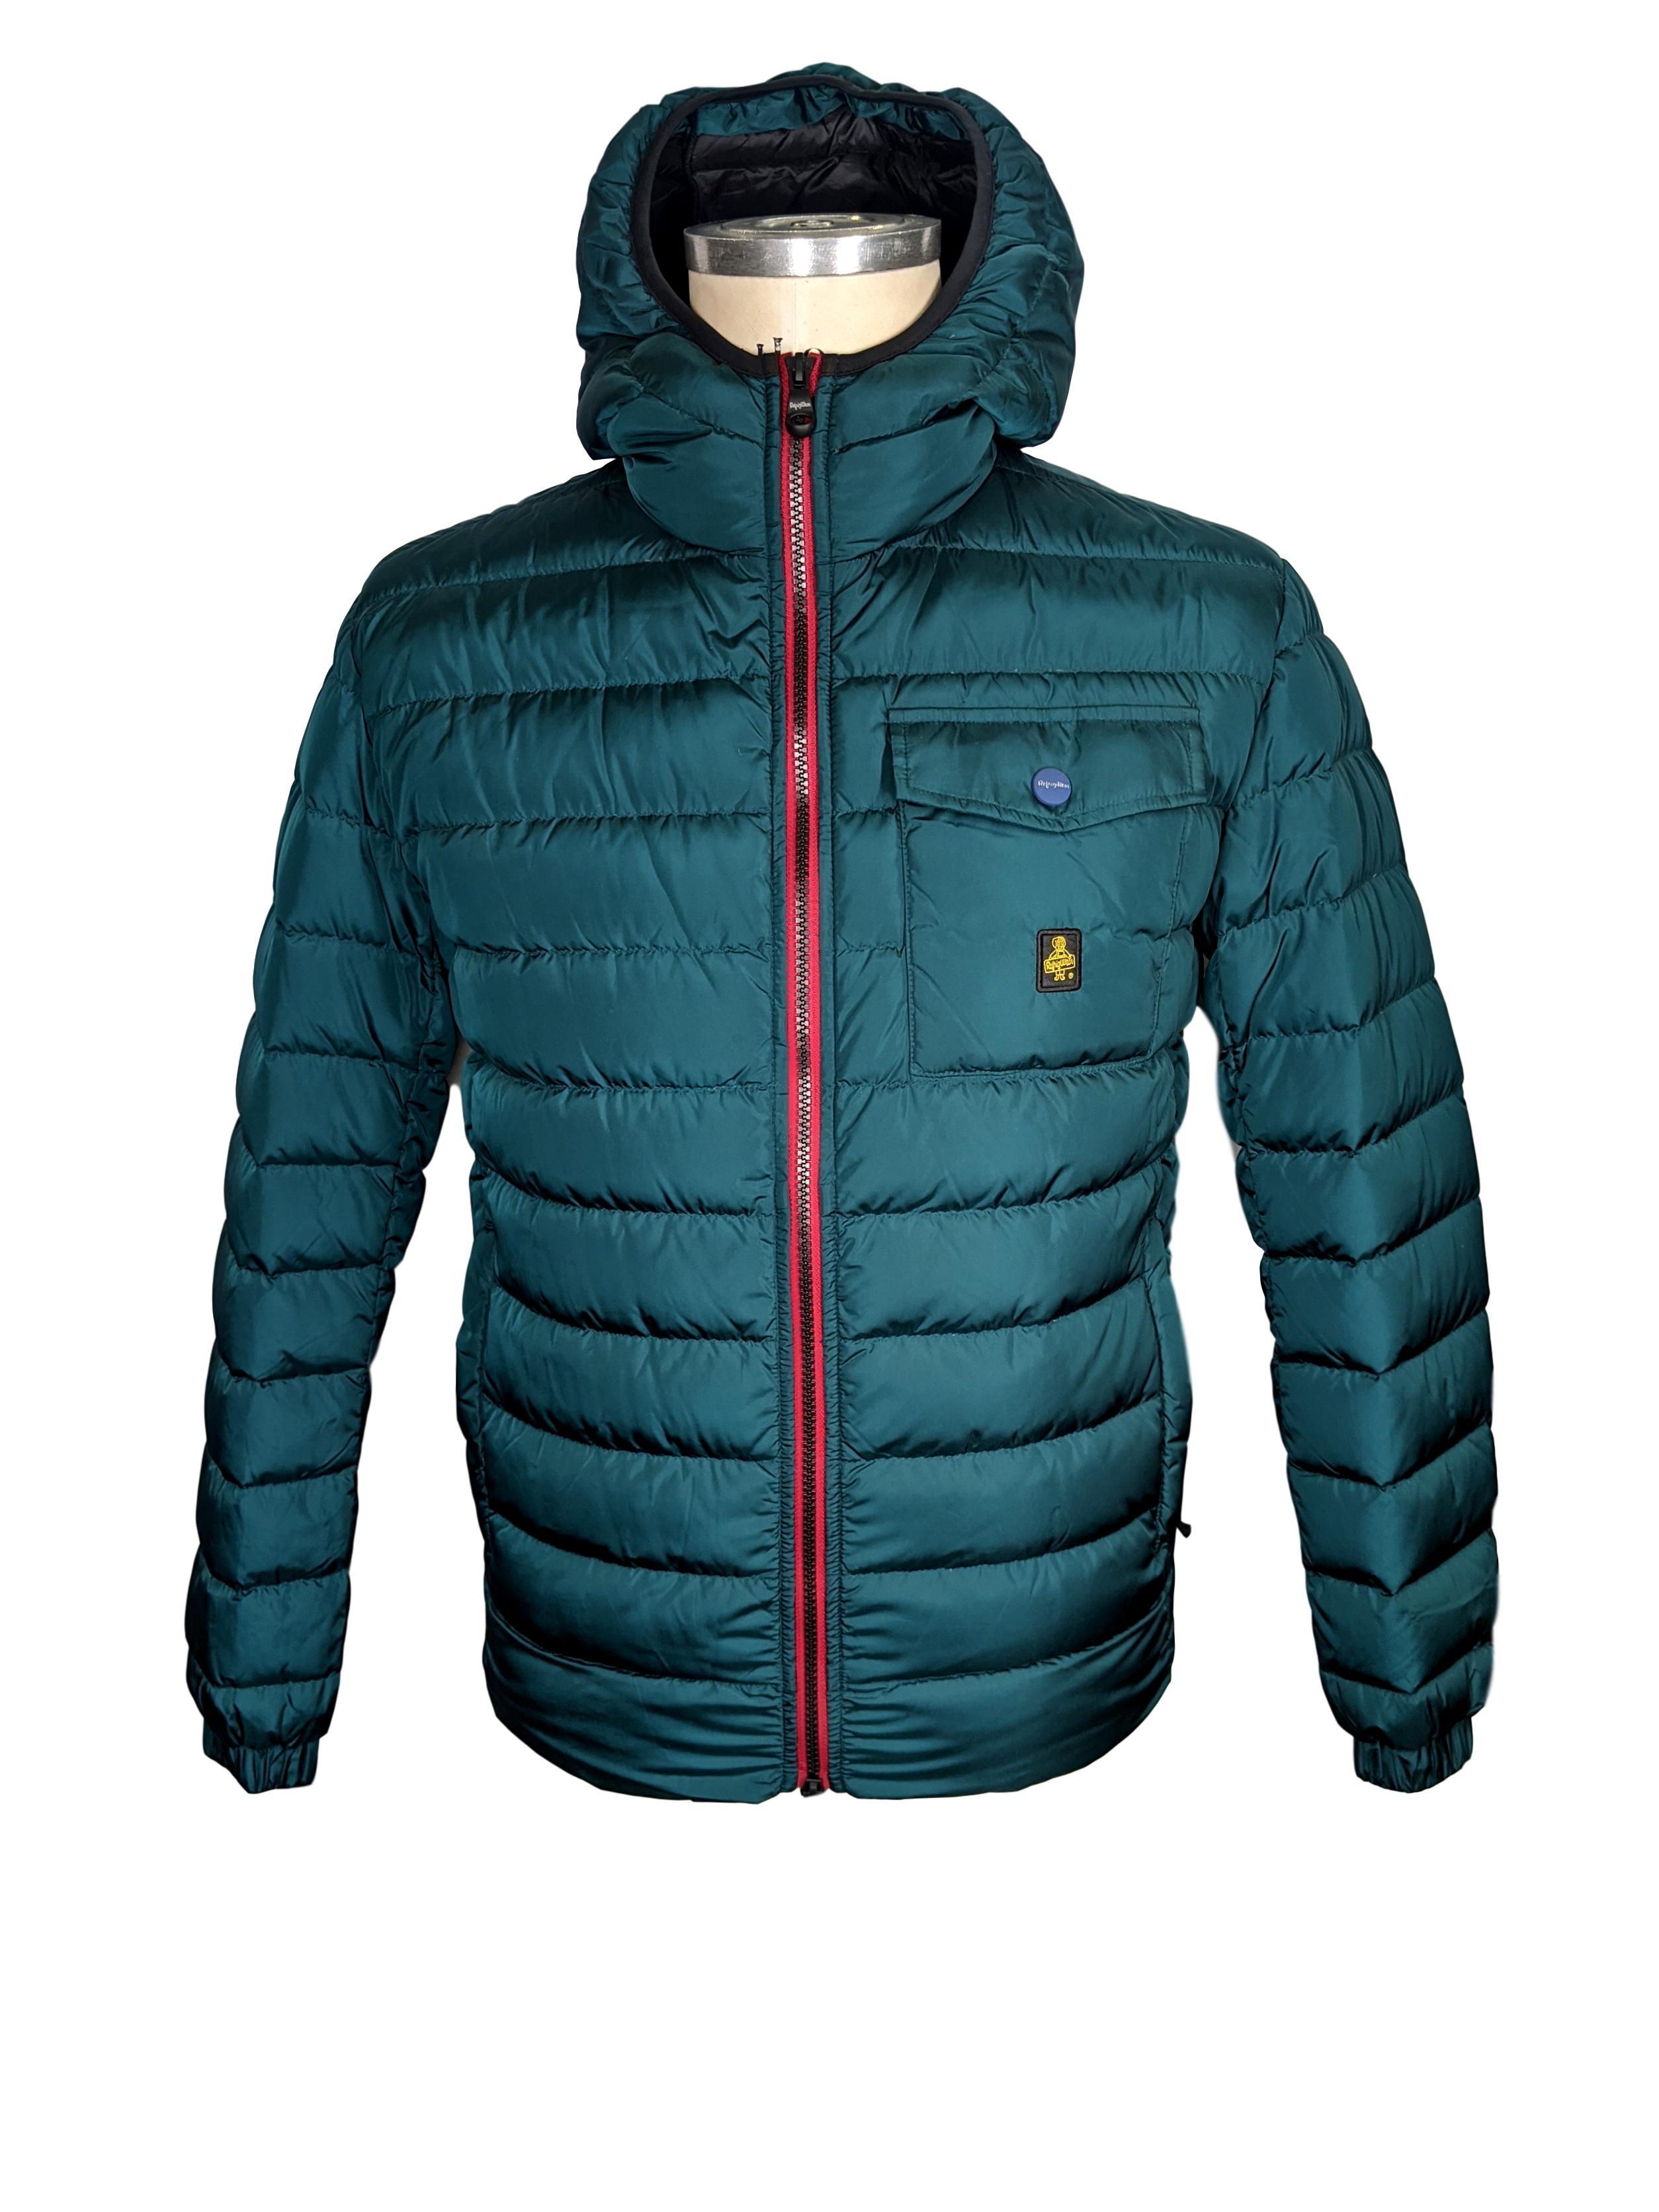 Hunter Jacket Refrigiwear Uomo REFRIGIWEAR UOMO | Giubbotti | R2.G927.NY07502240